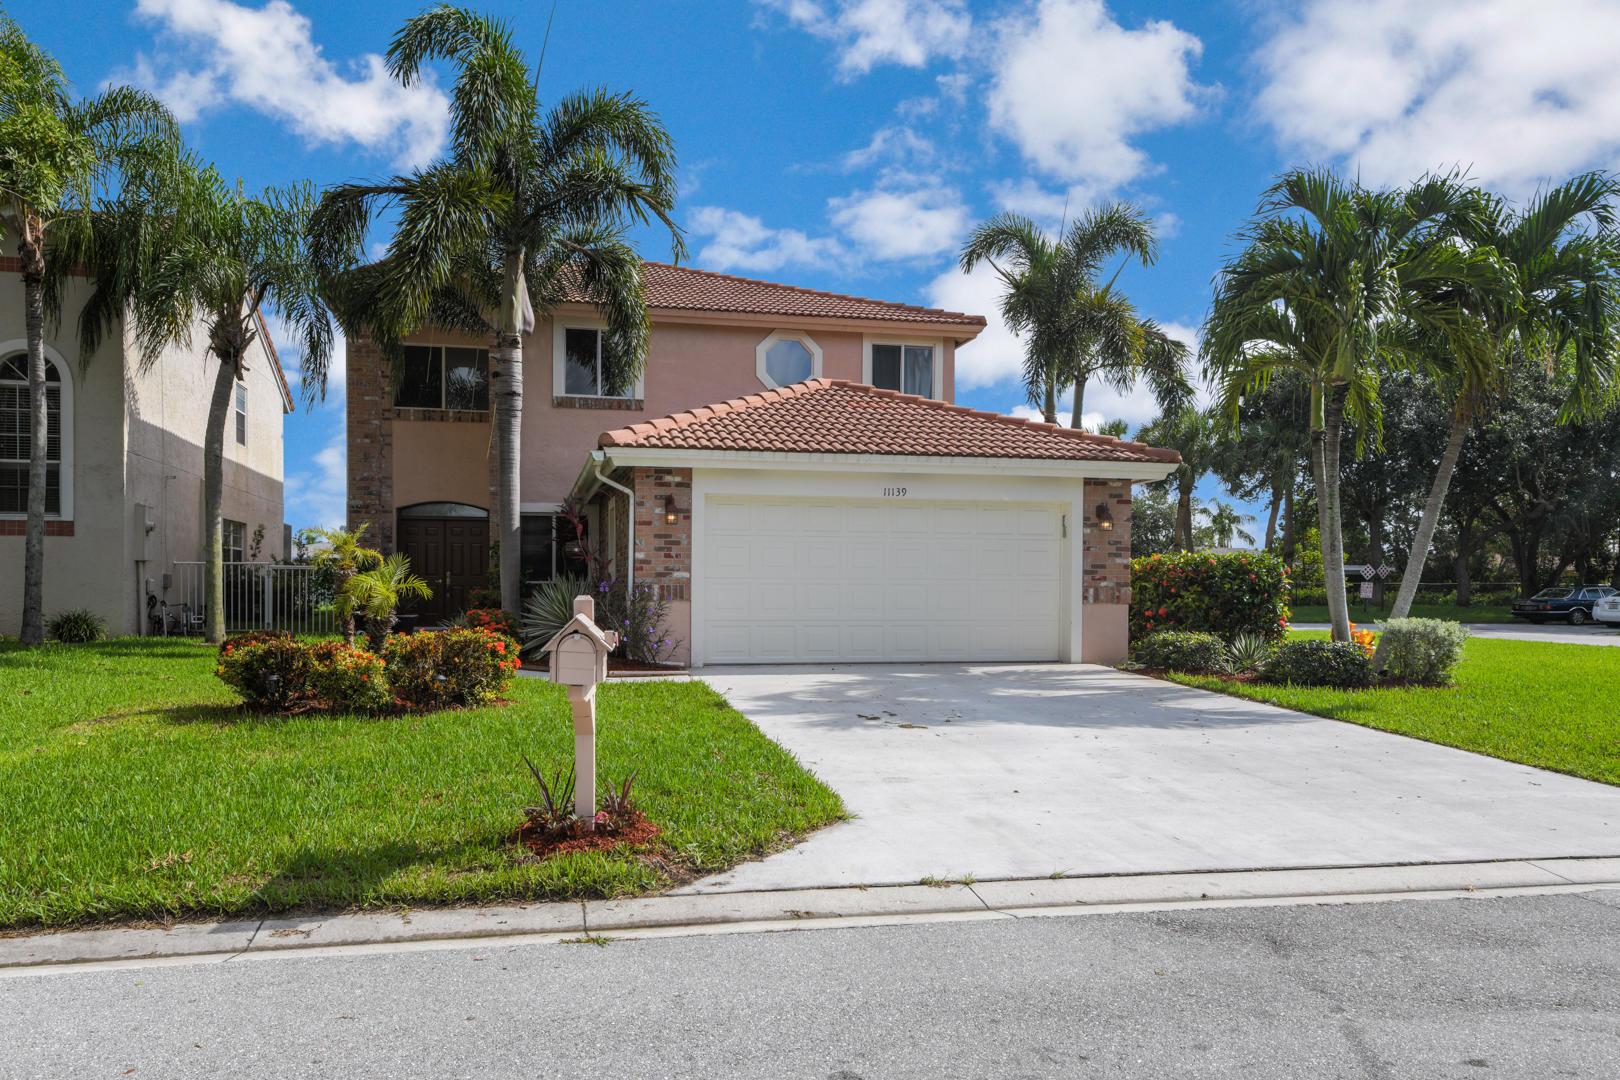 11139 Sandpoint Terrace Boca Raton, FL 33428